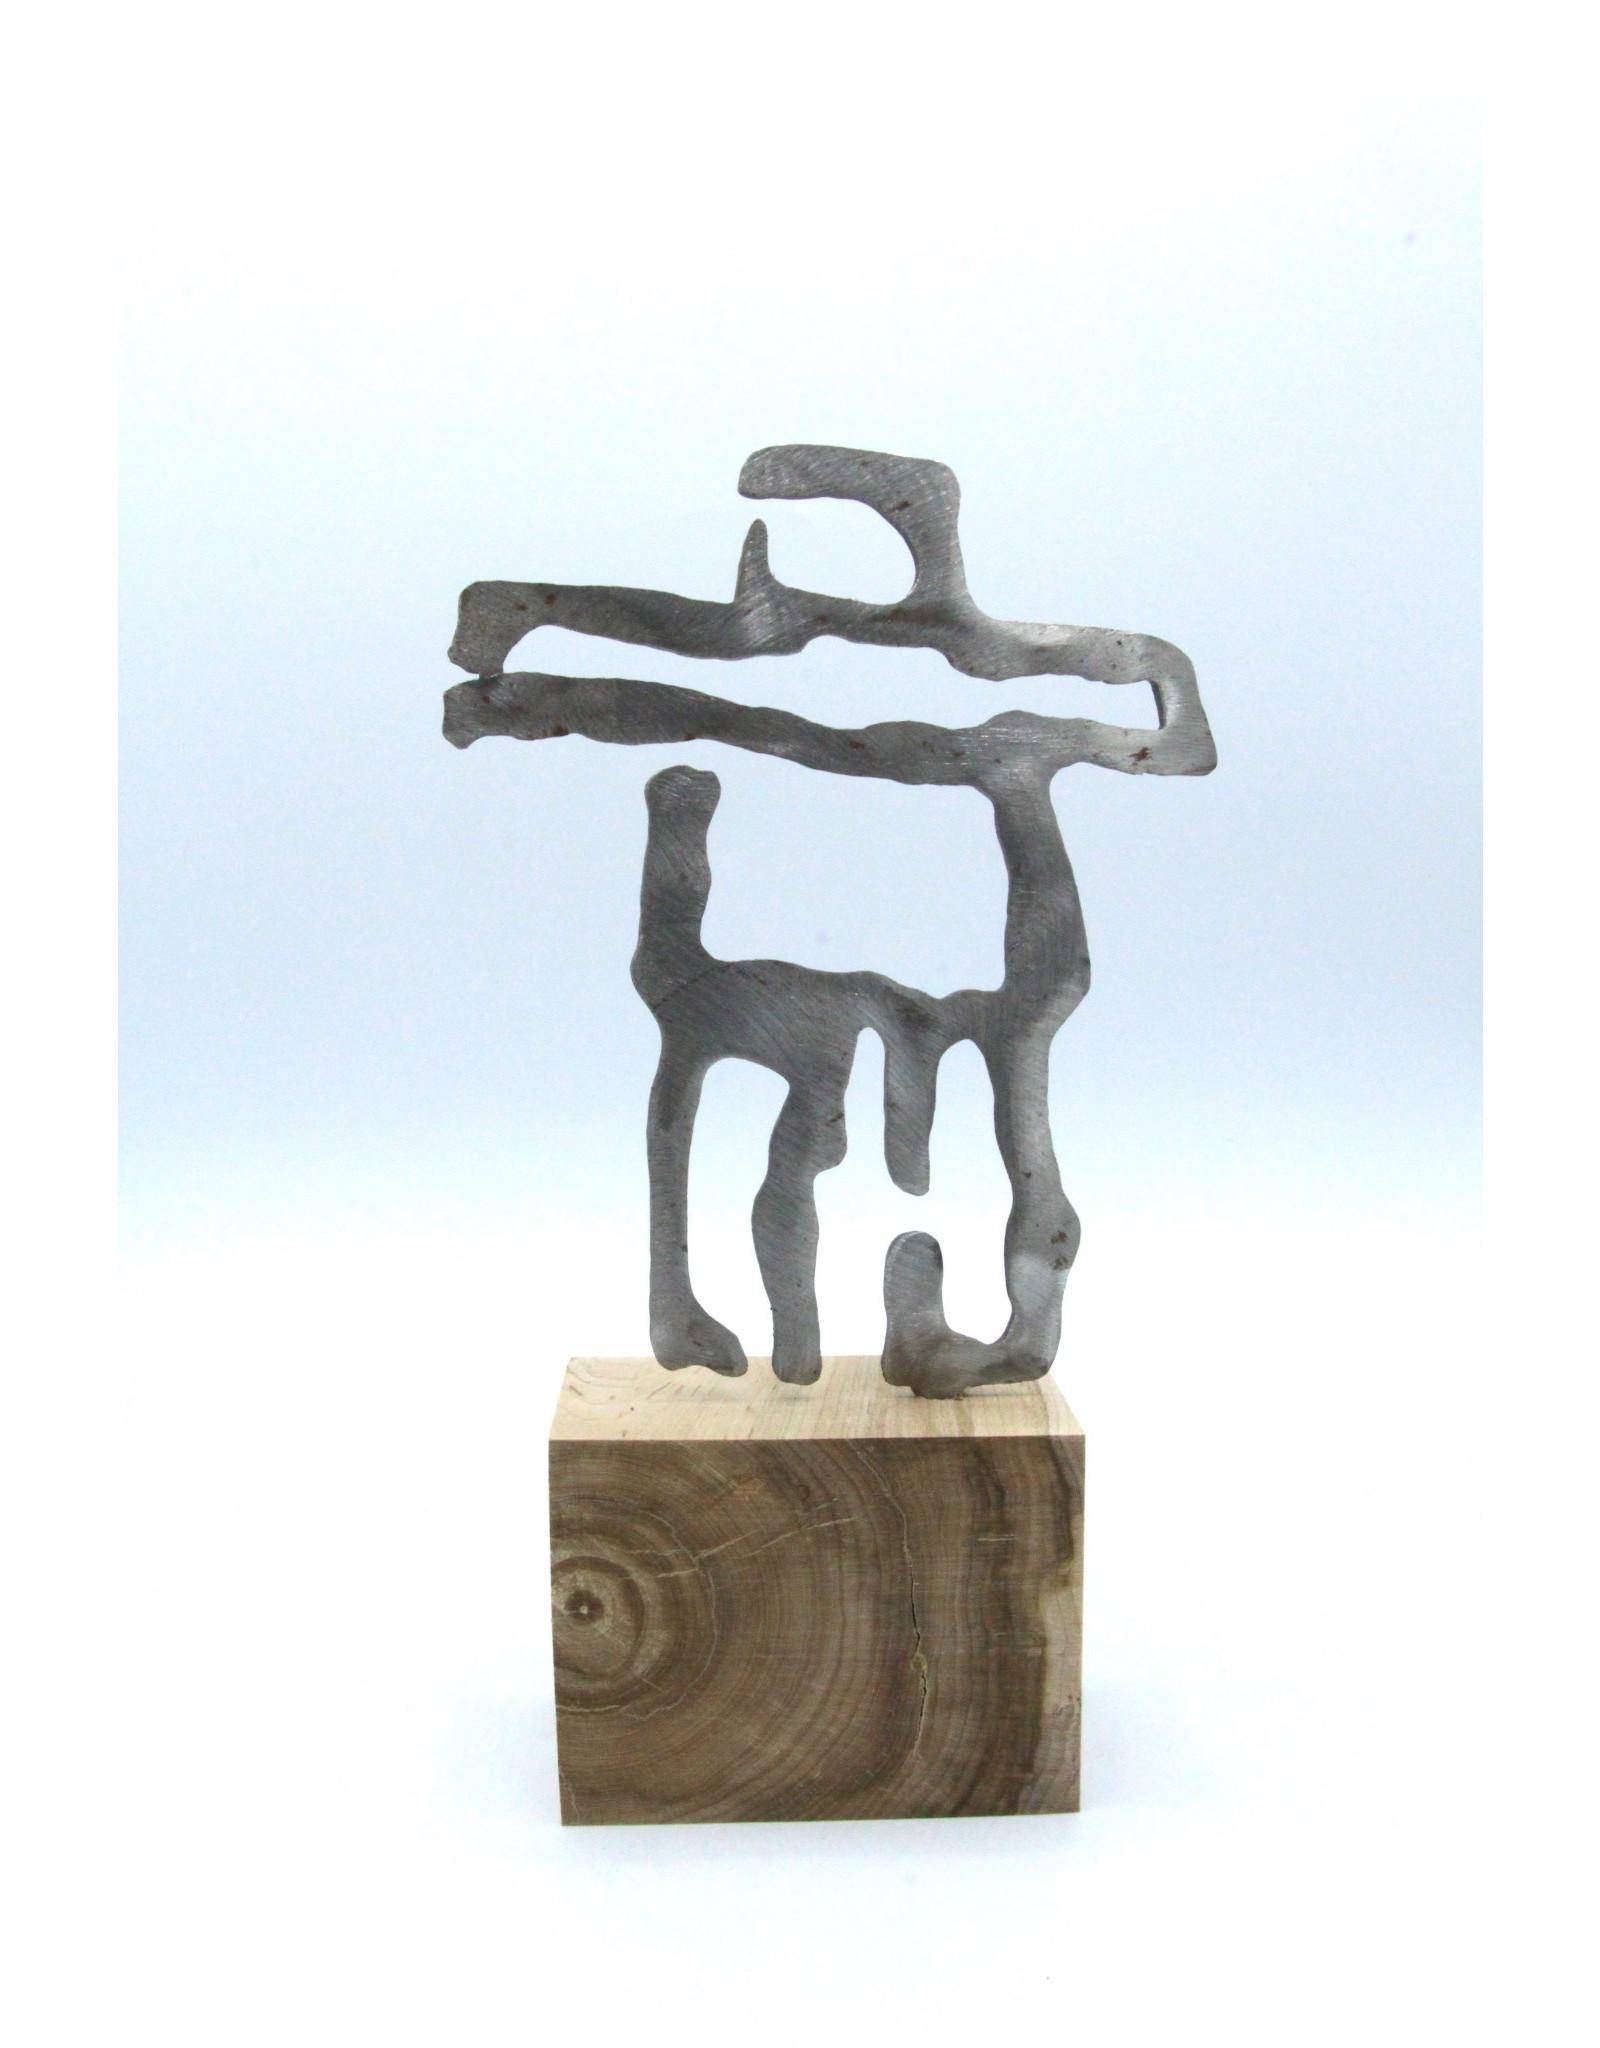 Metal Sculptures - Small Inukshuk